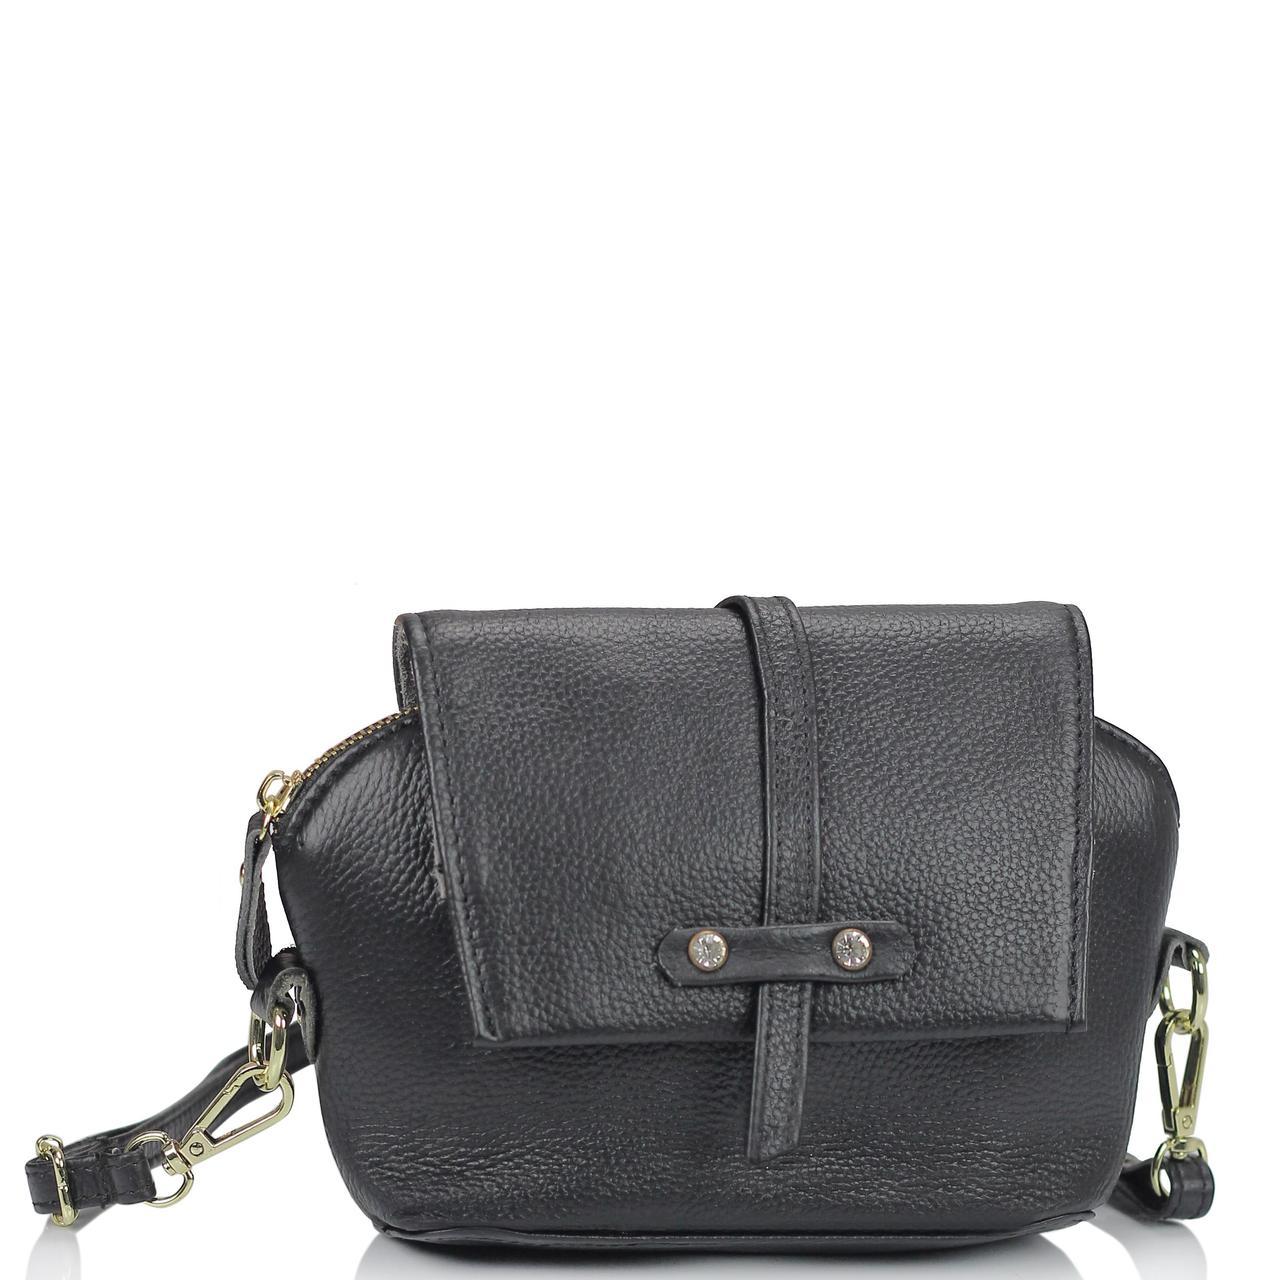 Женская кожаная сумочка кроссбоди черная Riche NM20-W645A